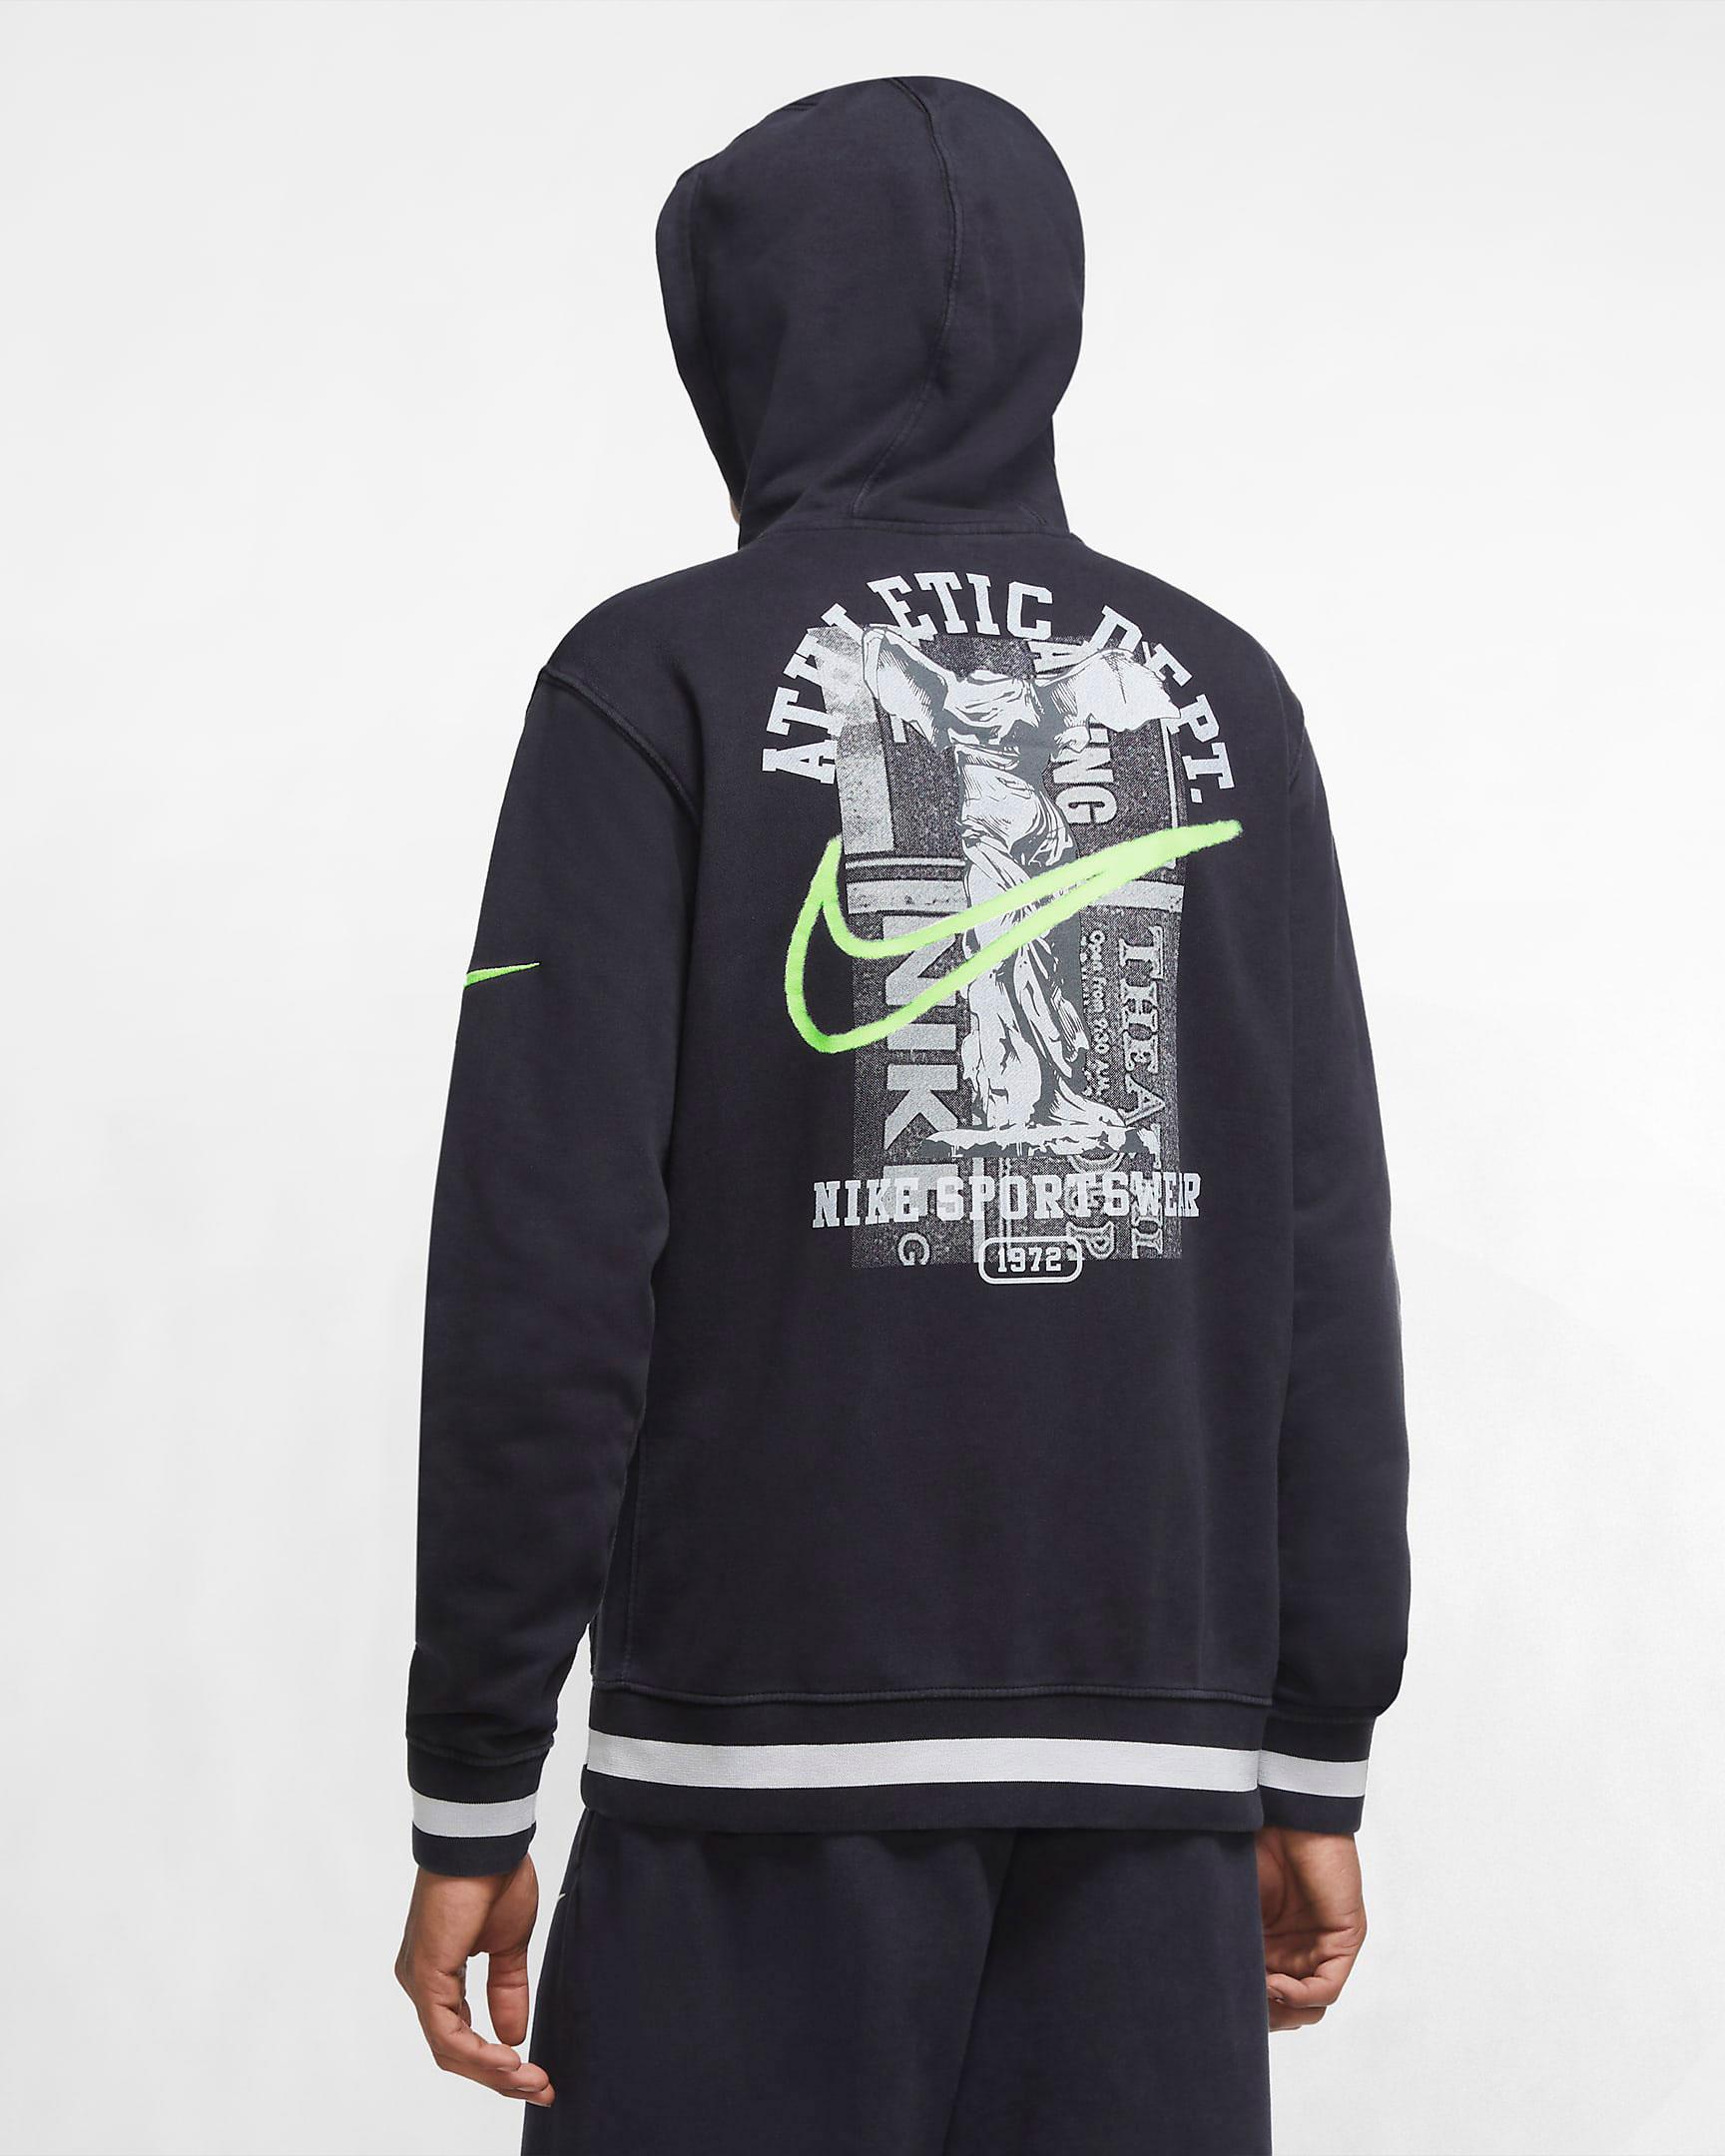 nike-club-fleece-hoodie-class-of-72-black-volt-2